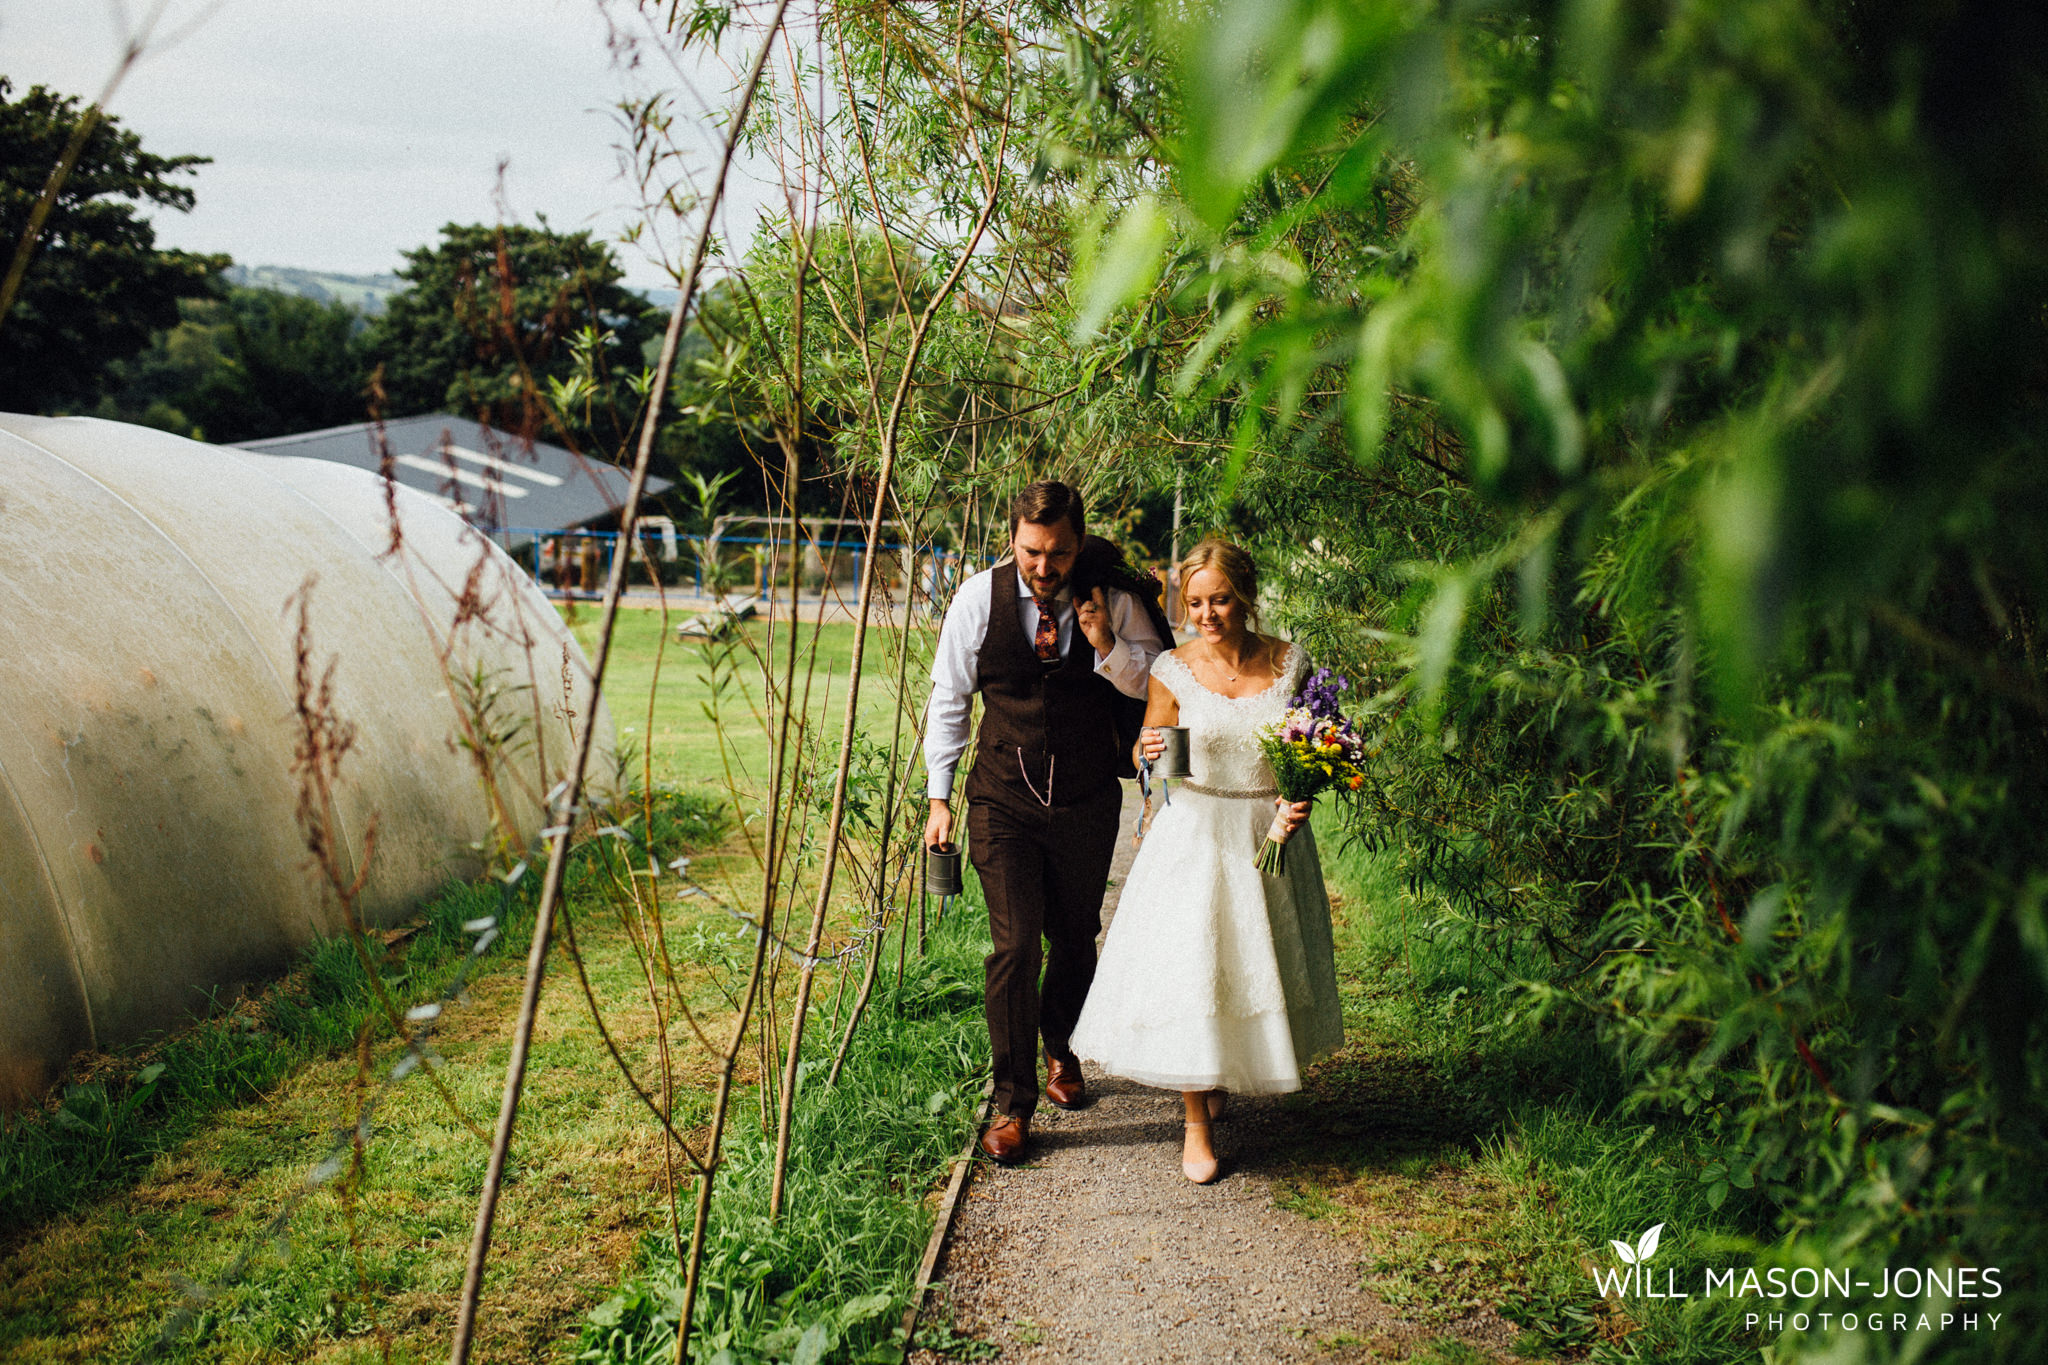 pen-y-banc-farm-tipi-wedding-decoration-photography